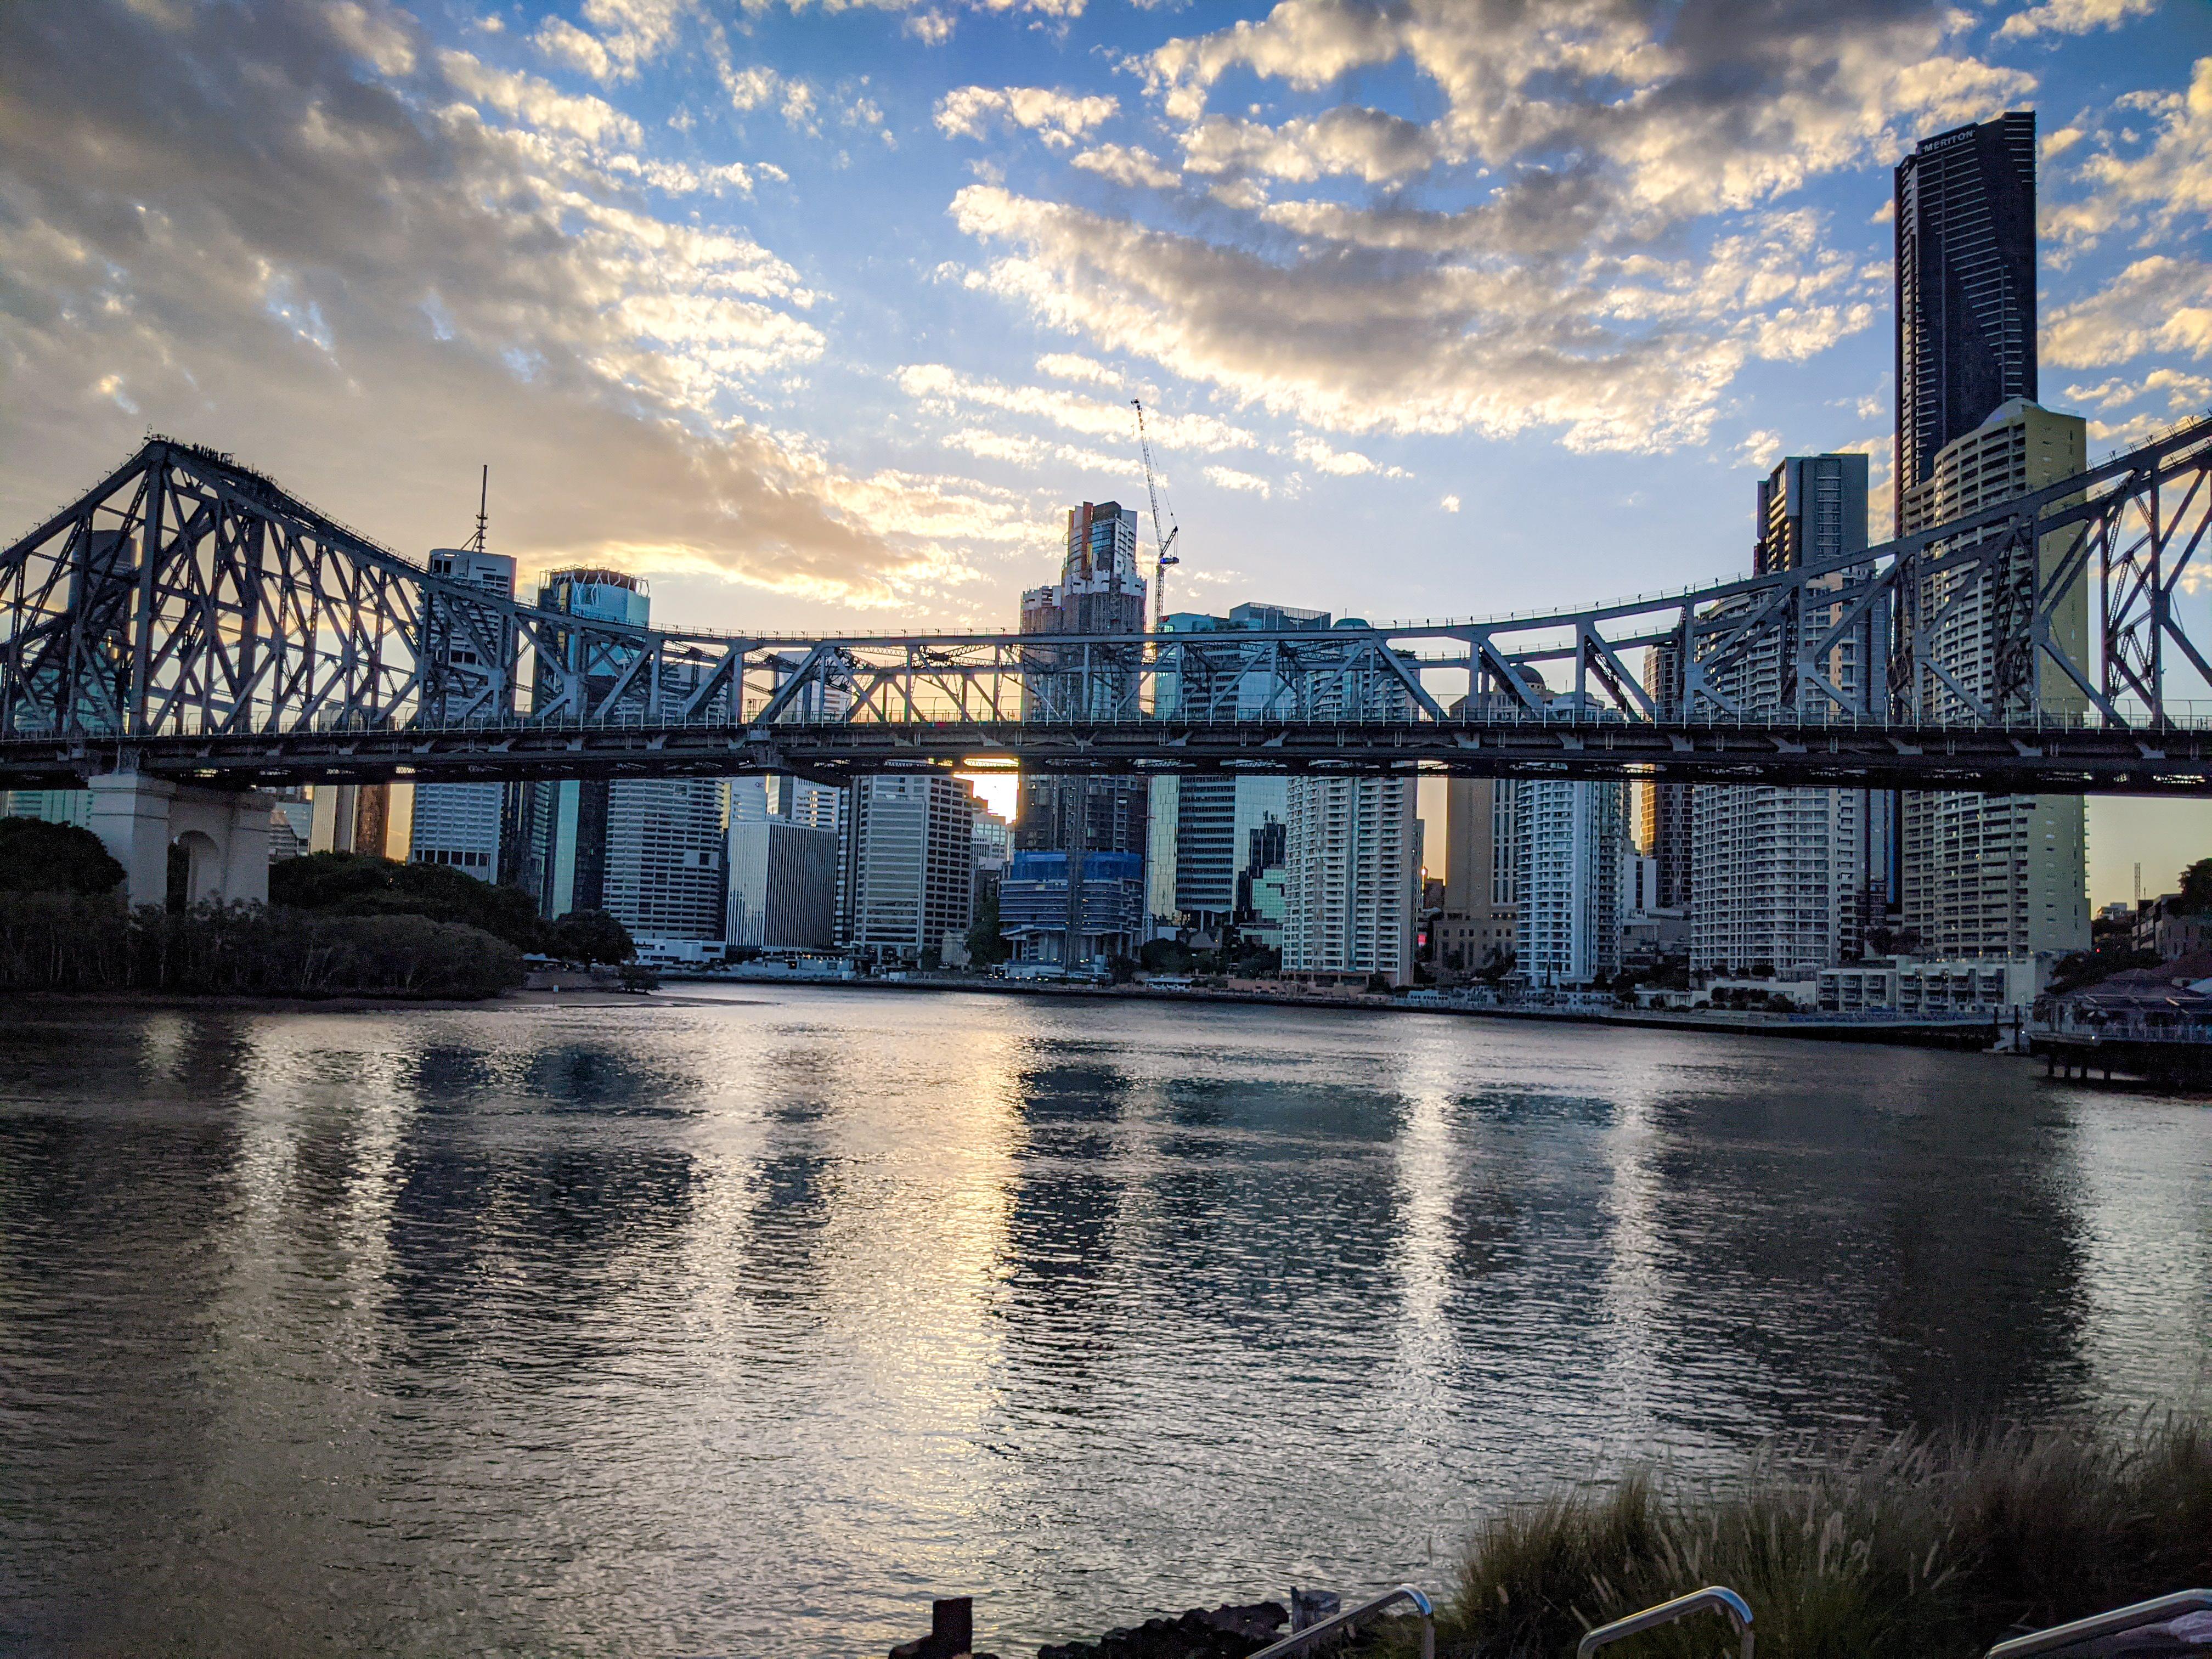 The Storey Bridge with the Brisbane CBD behind